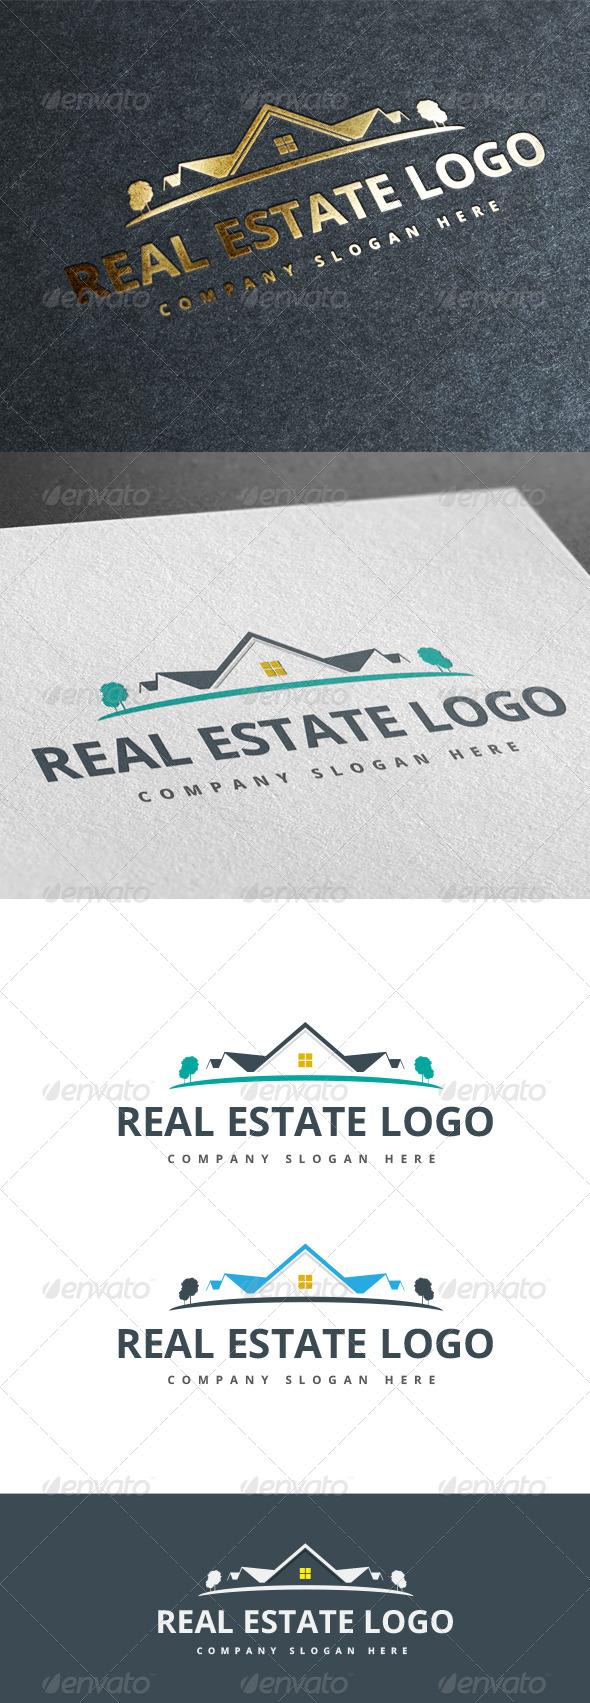 Real Estate Logo V.2